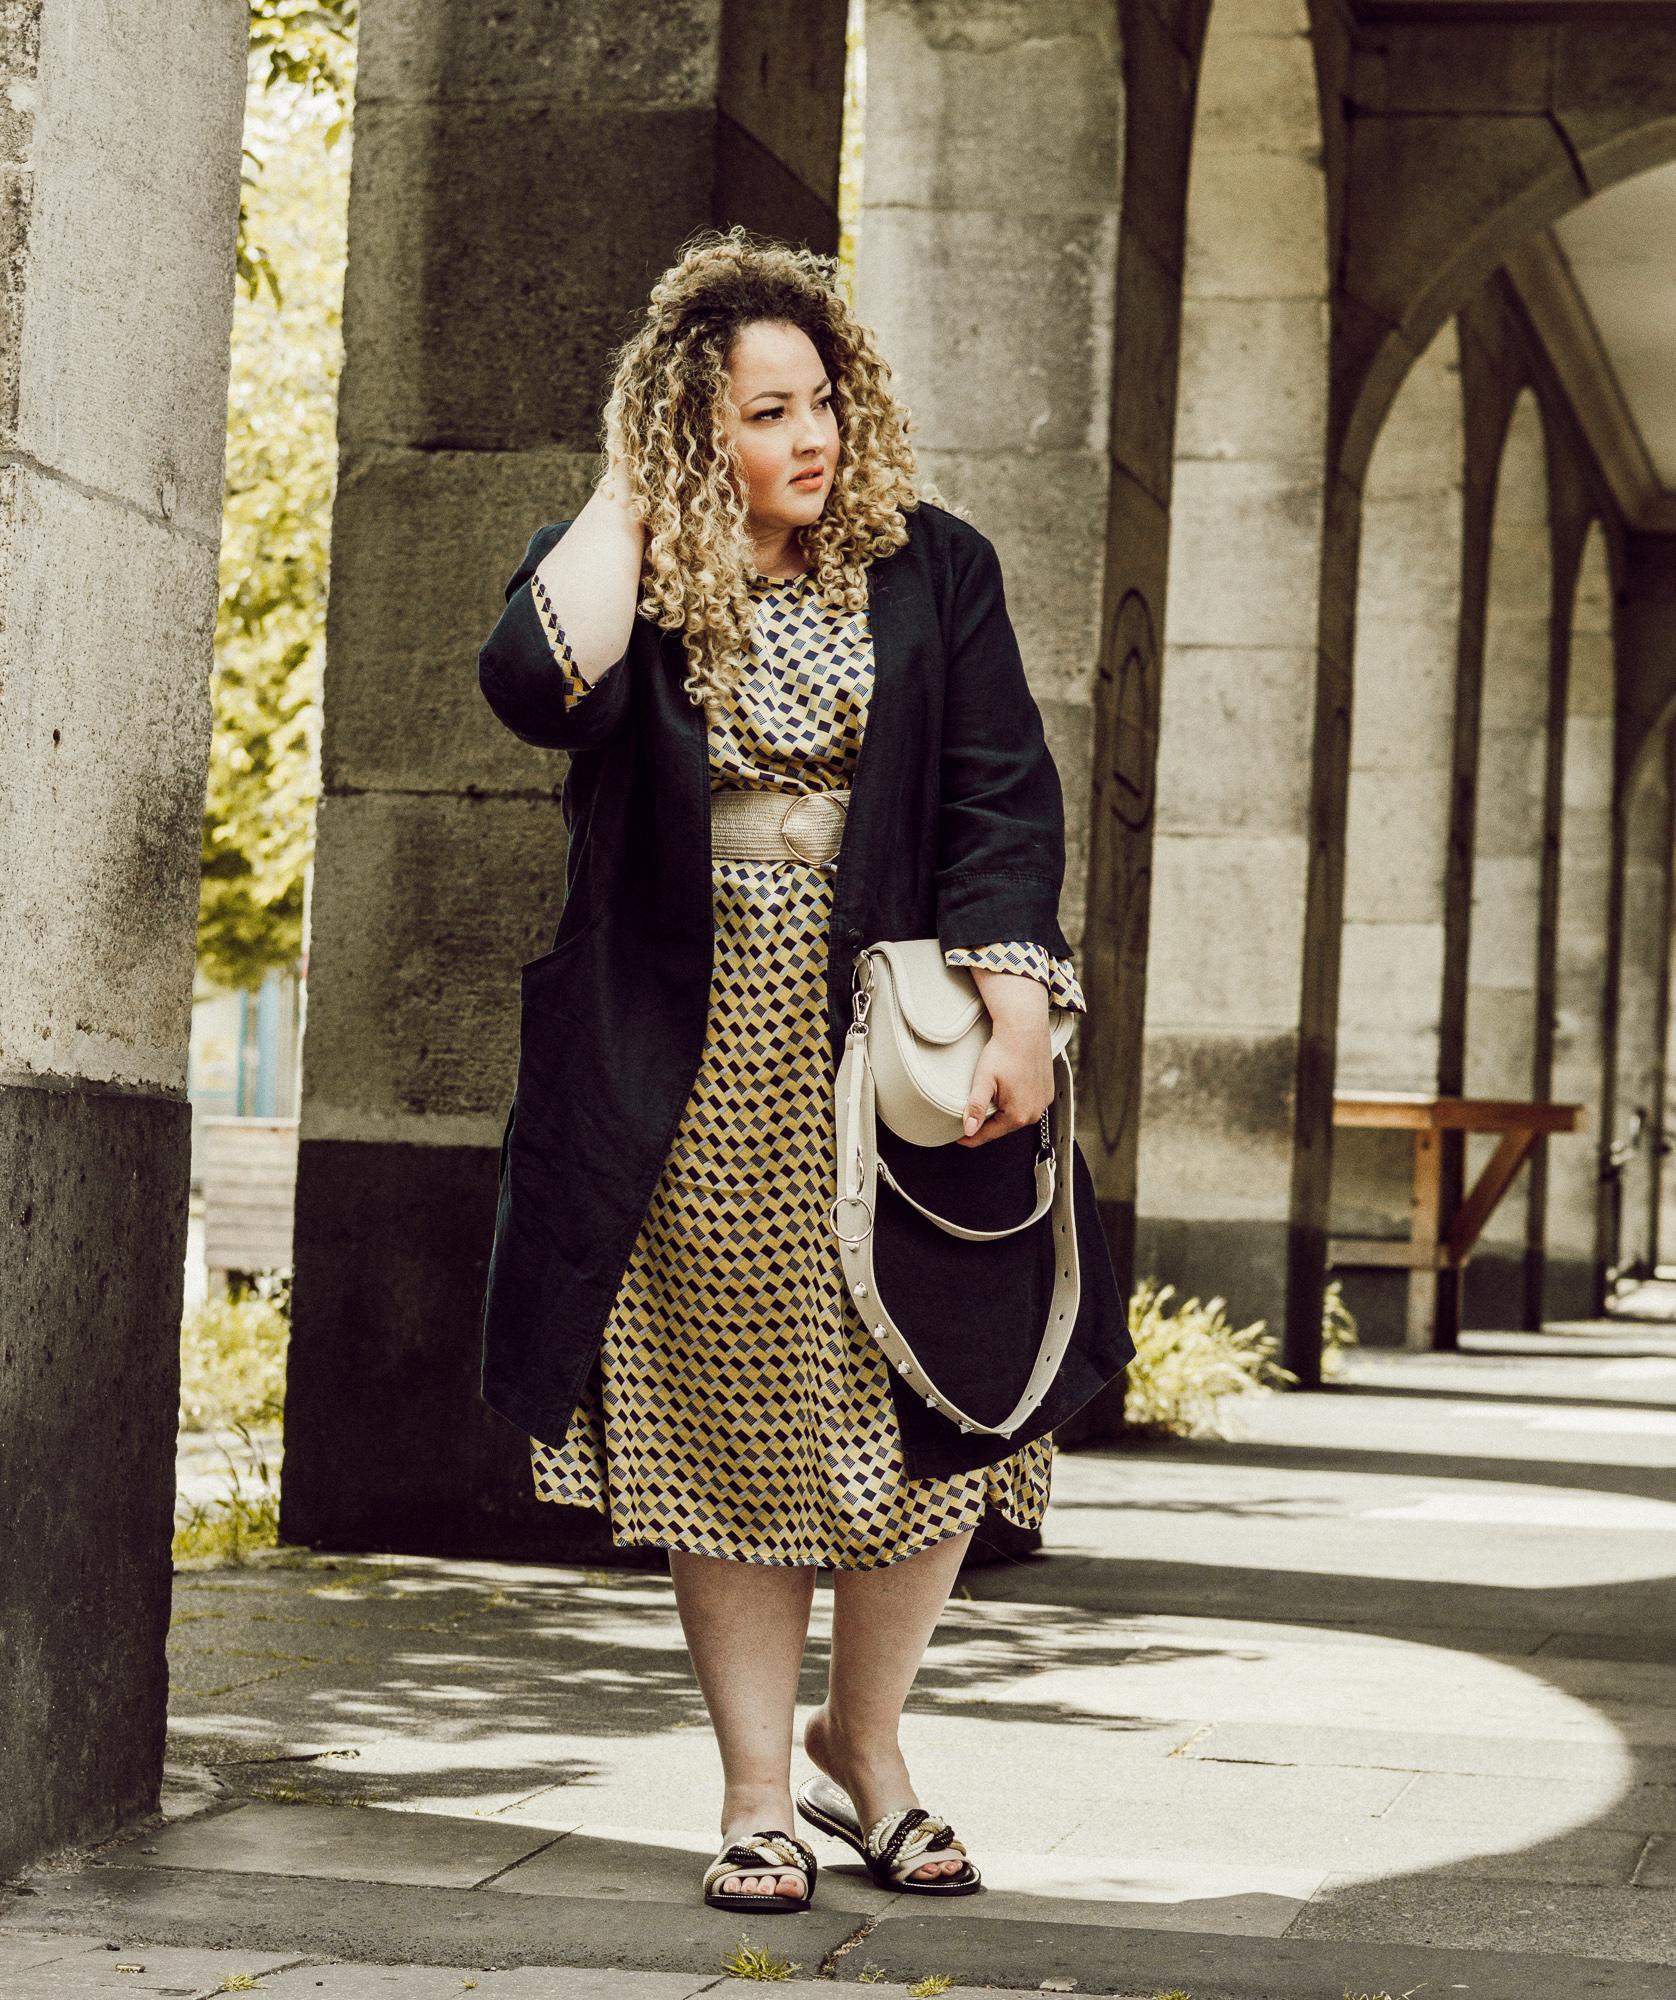 mia_infatstyle_@infatstyle:_blogger_curvy_große_größen_mode_fashion_blog.